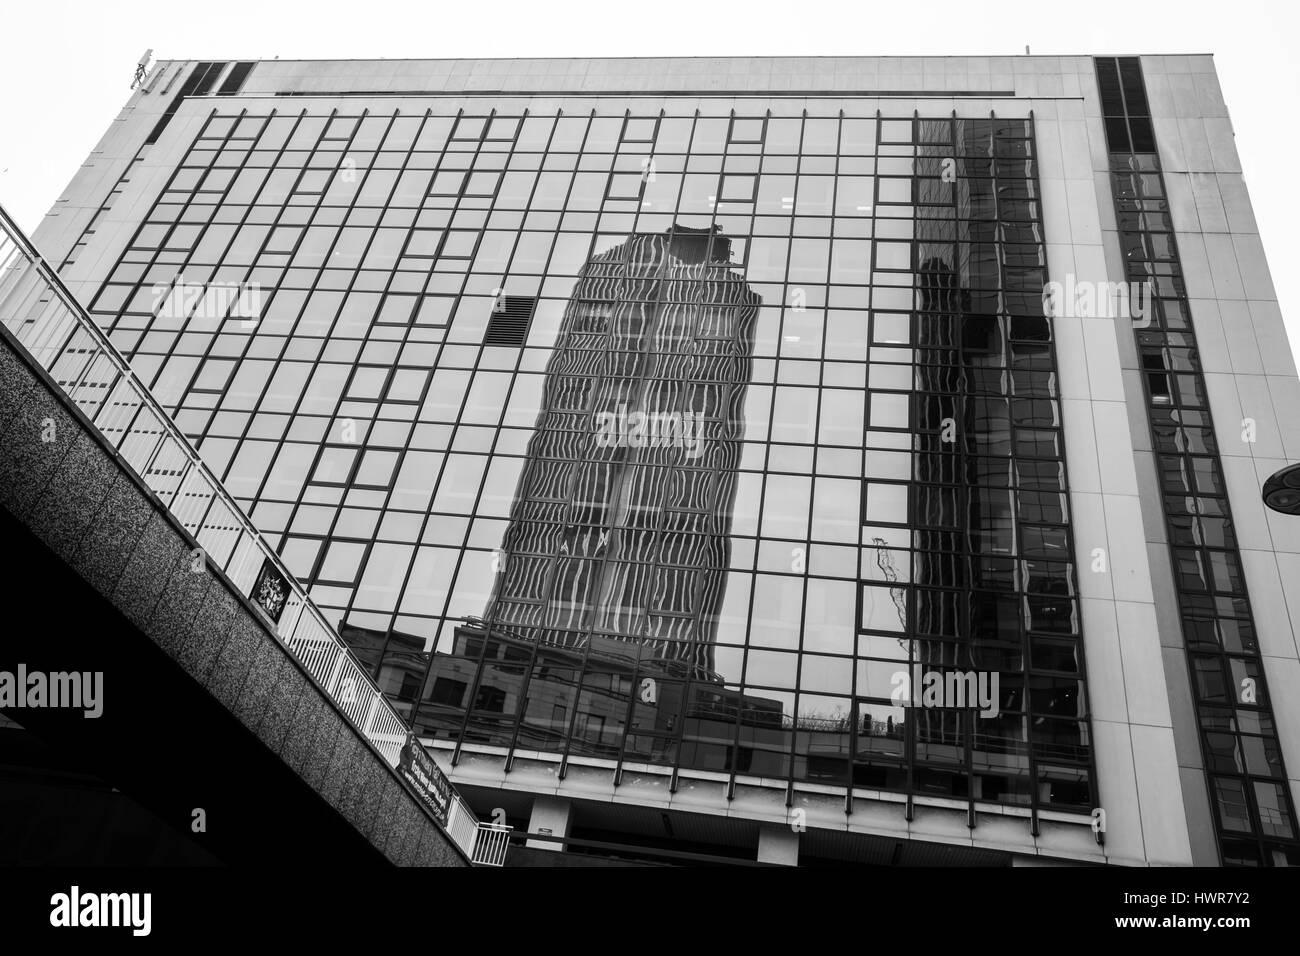 Tower 42, City of London, England. Stockbild